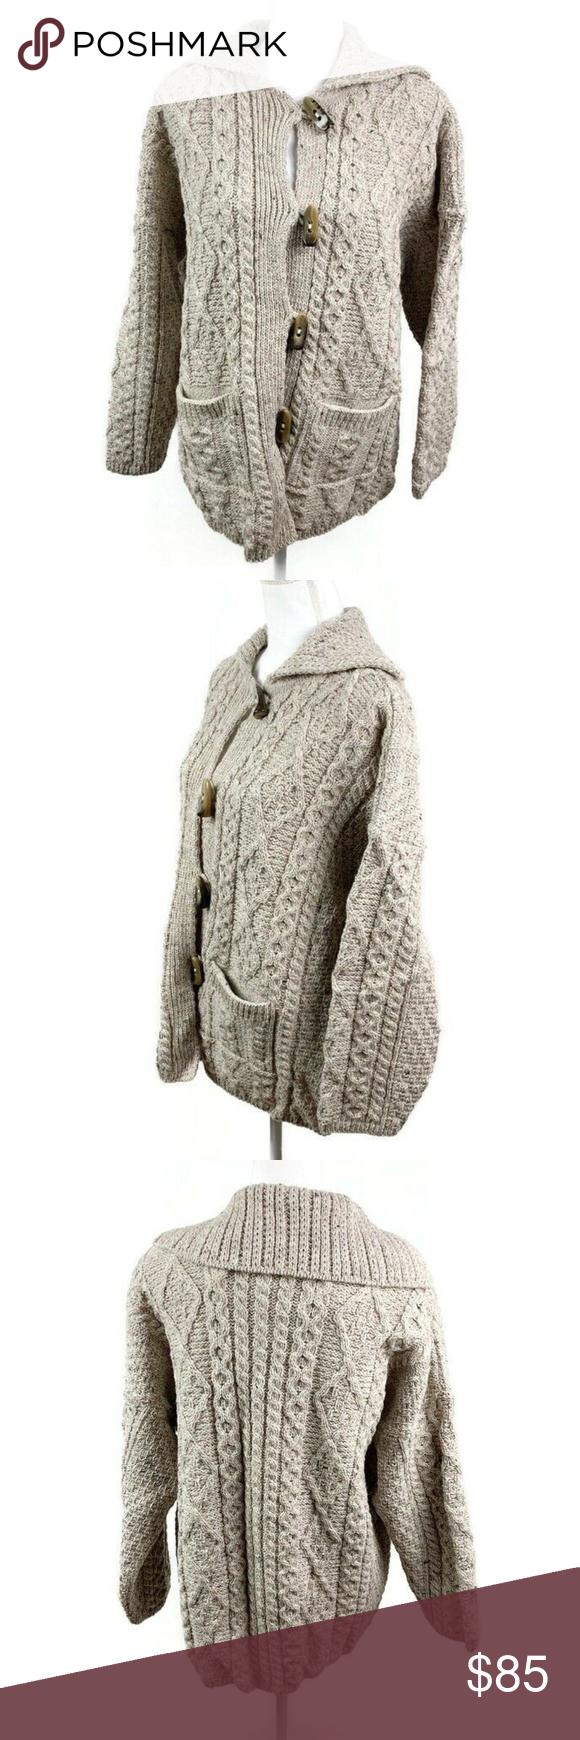 NEW Connemara Made In Ireland Cable Knit Cardigan Connemara Knitwear Women's L L…